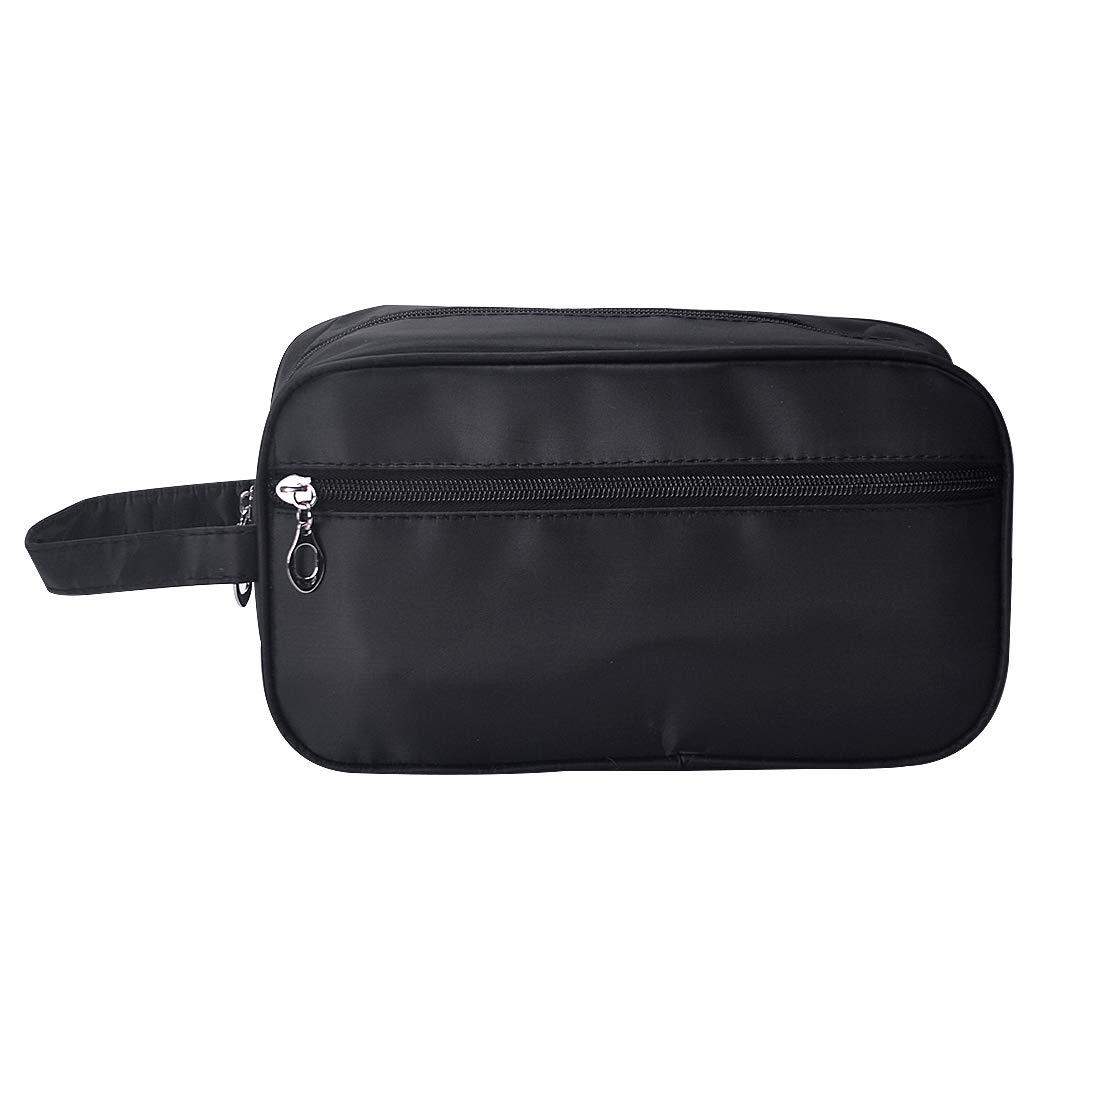 421cf2393d09 iSuperb Toiletry Bag Travel Organizer Classy Waterproof Portable Wash Gym  Shaving Bag for Men...